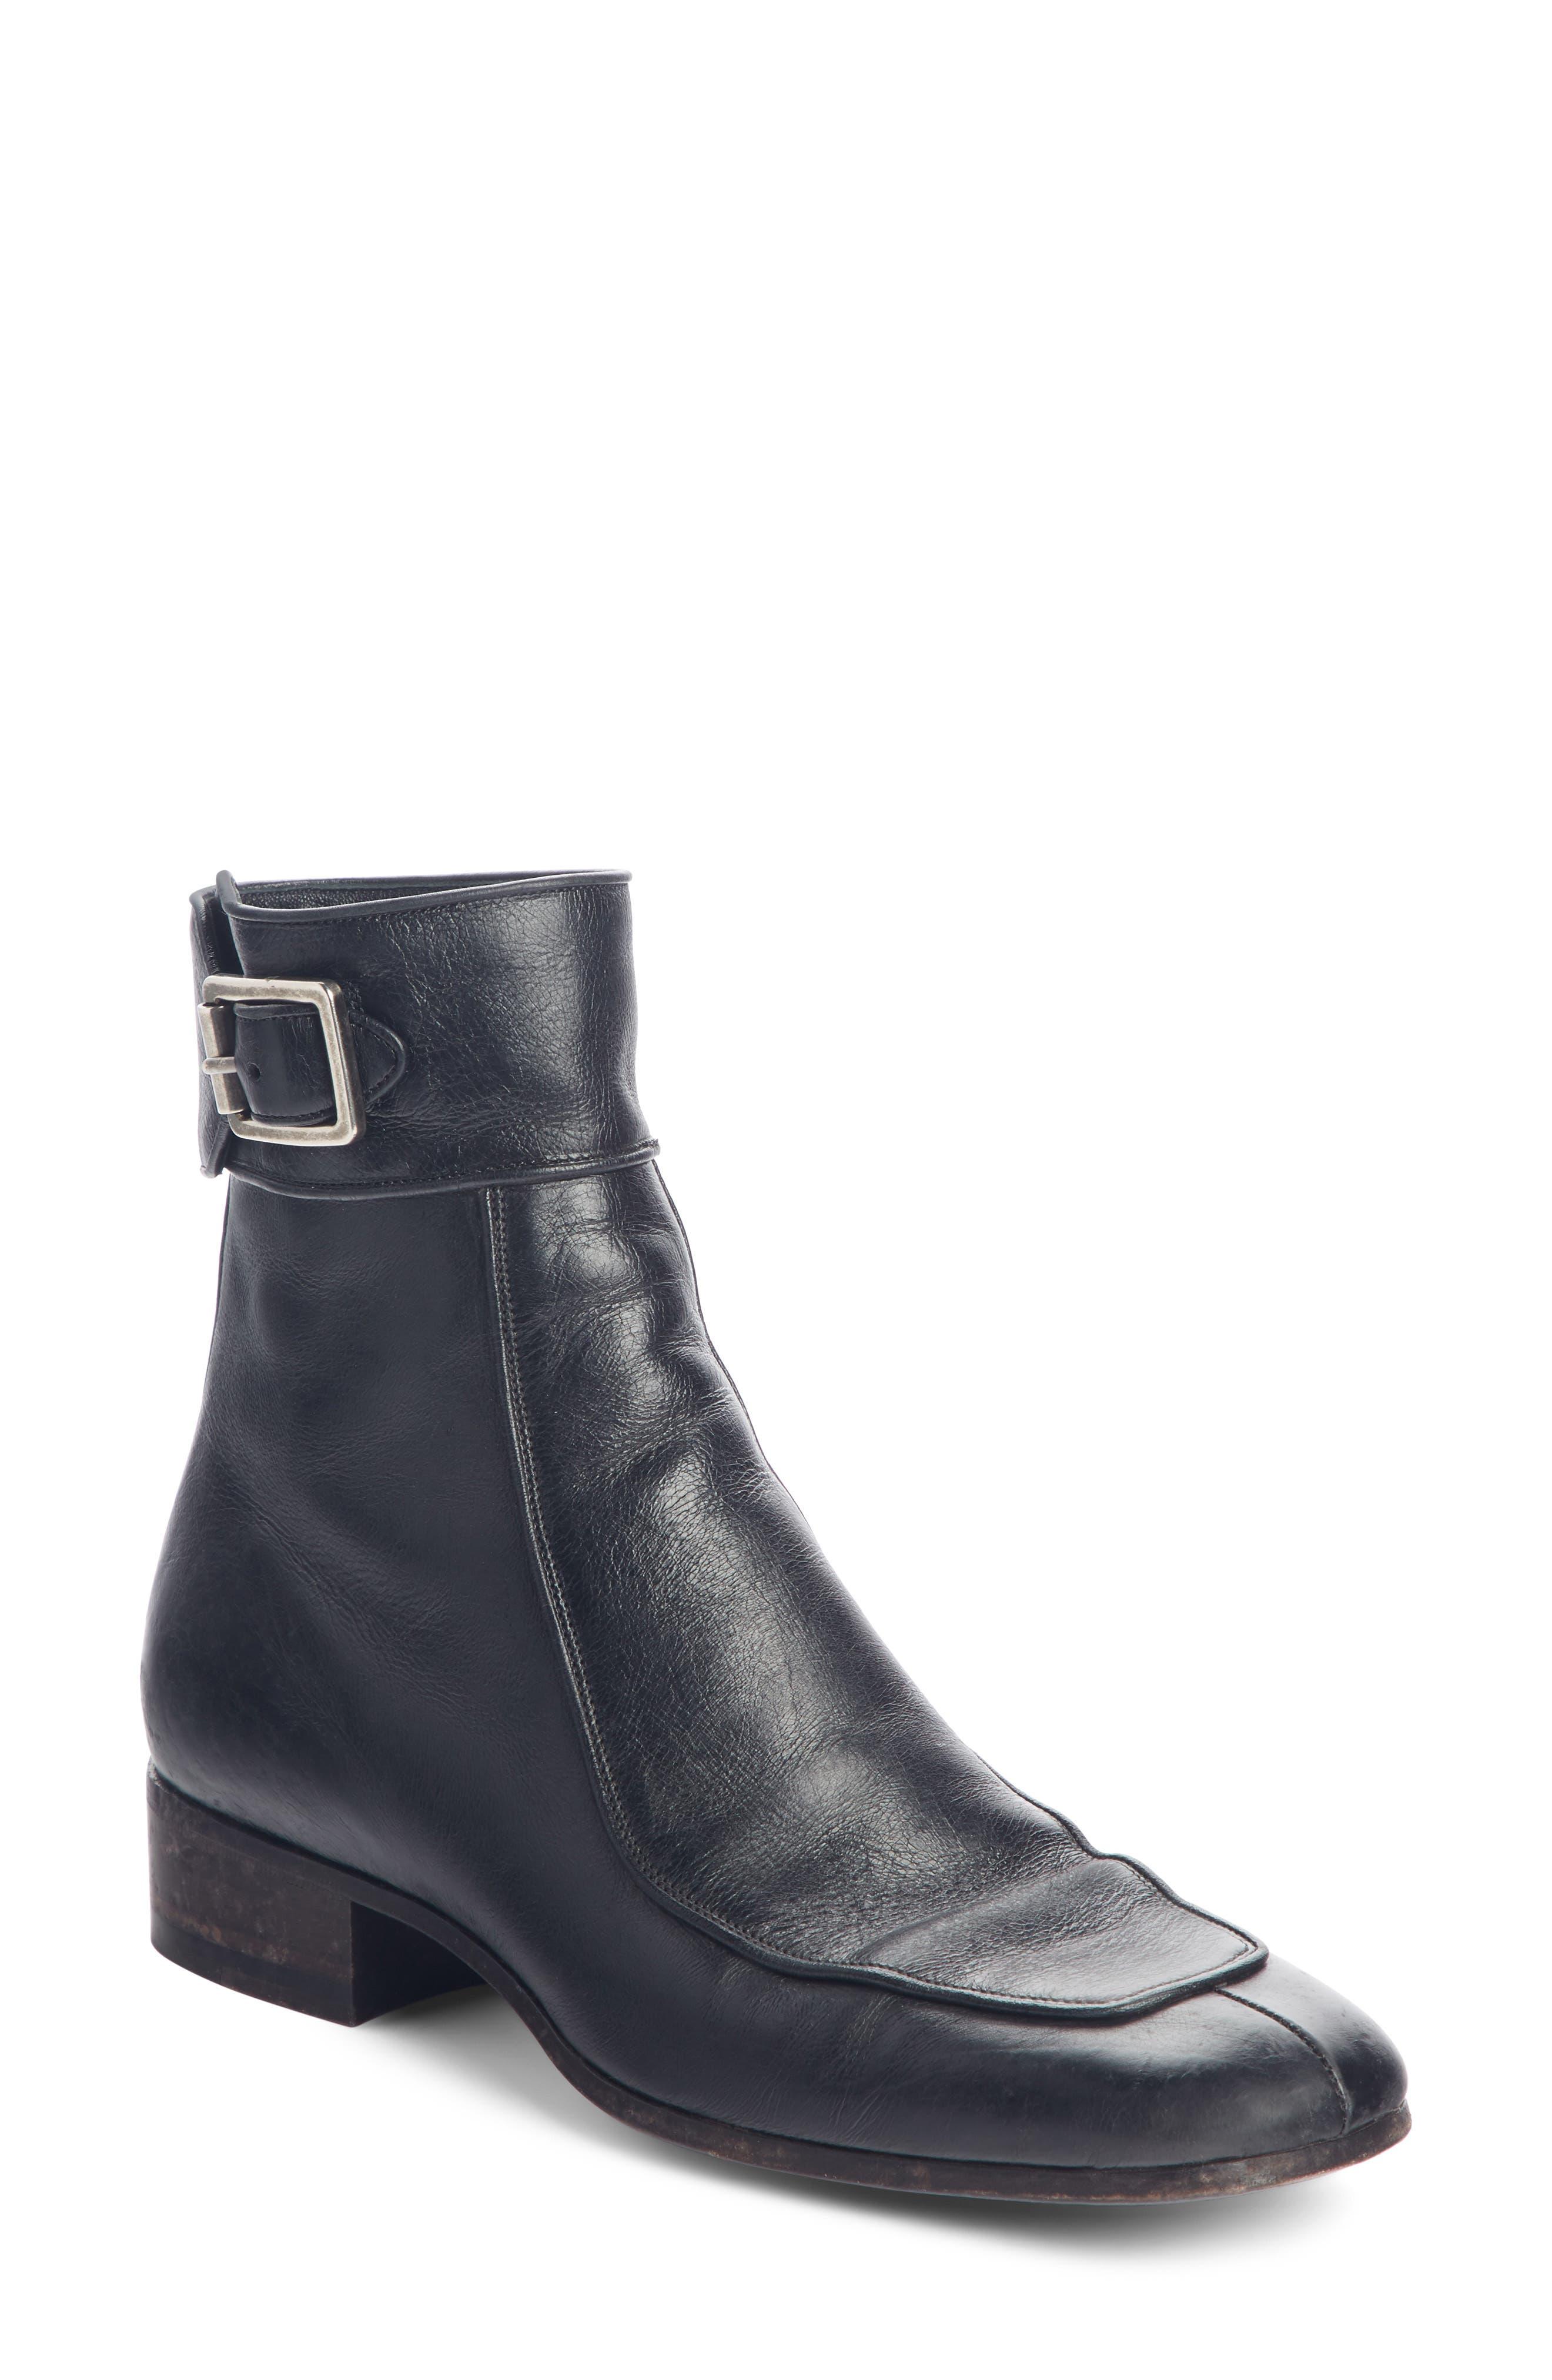 Saint Laurent Miles Buckle Cuff Boot - Black